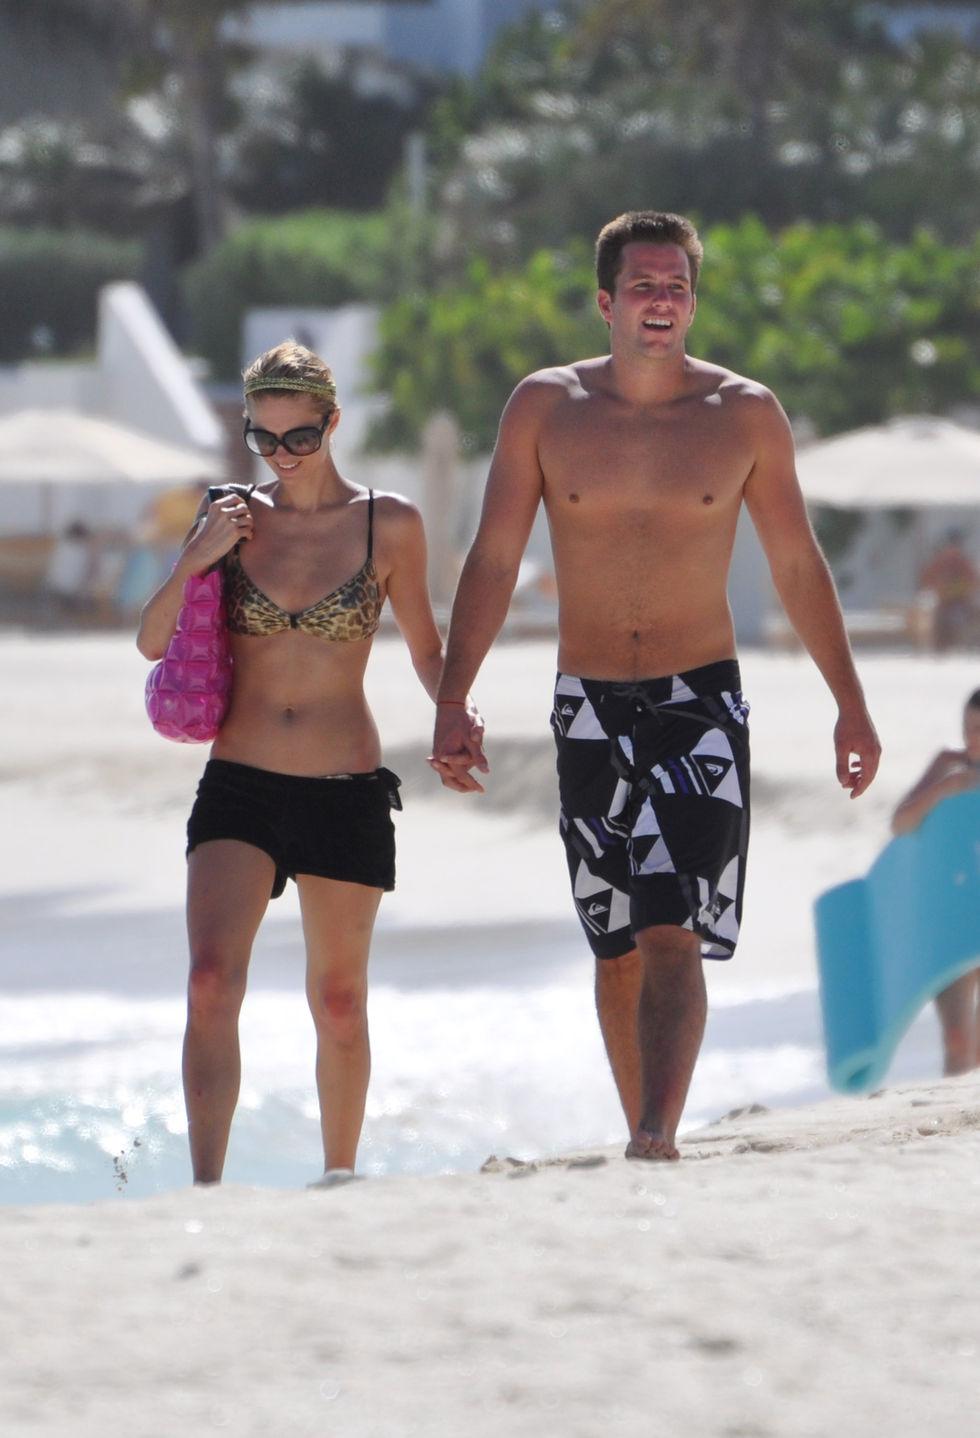 paris-hilton-bikini-candids-at-the-beach-in-anguilla-01